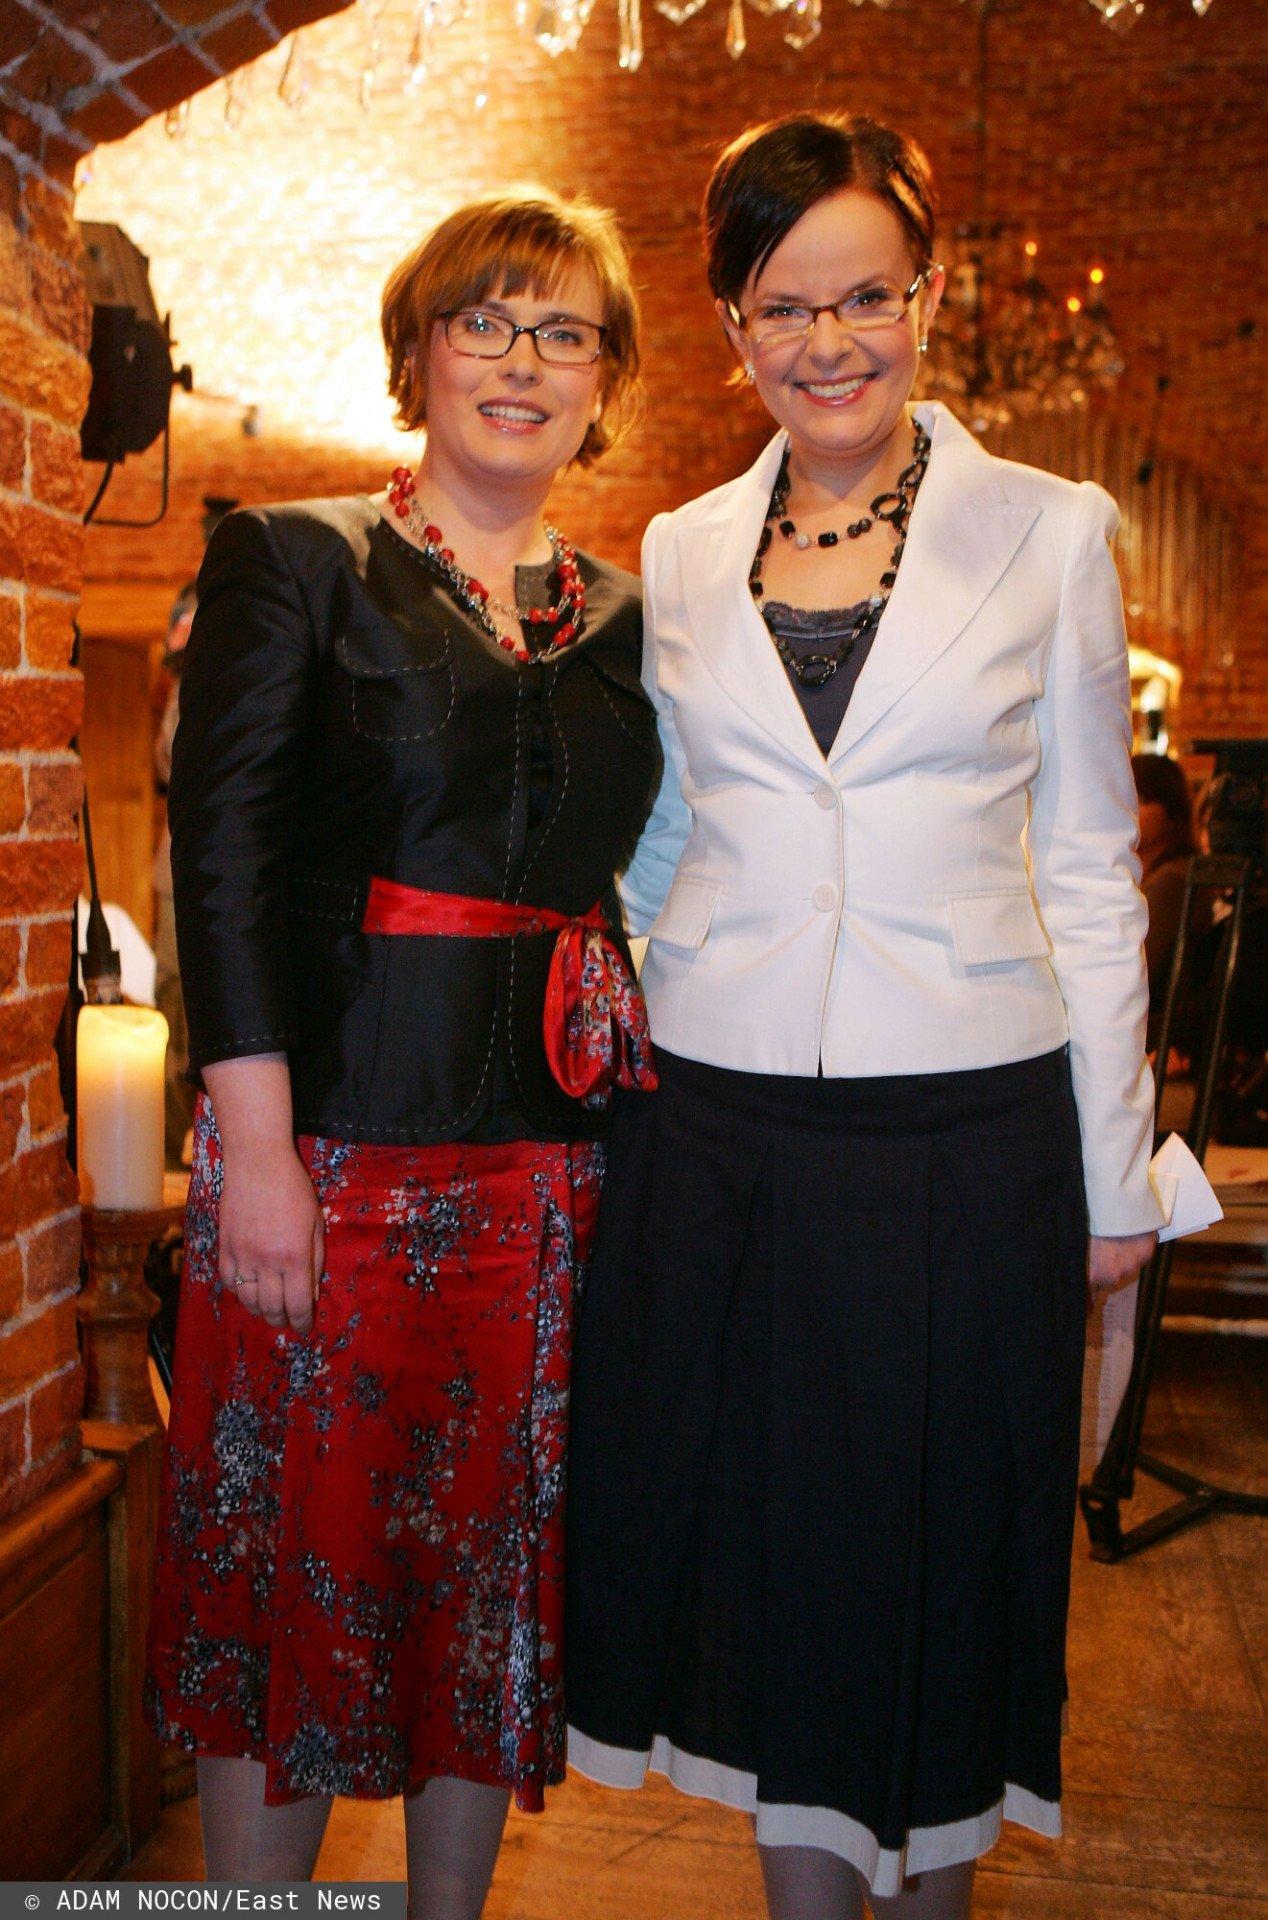 Korwin-Piotrowska dziennikarka